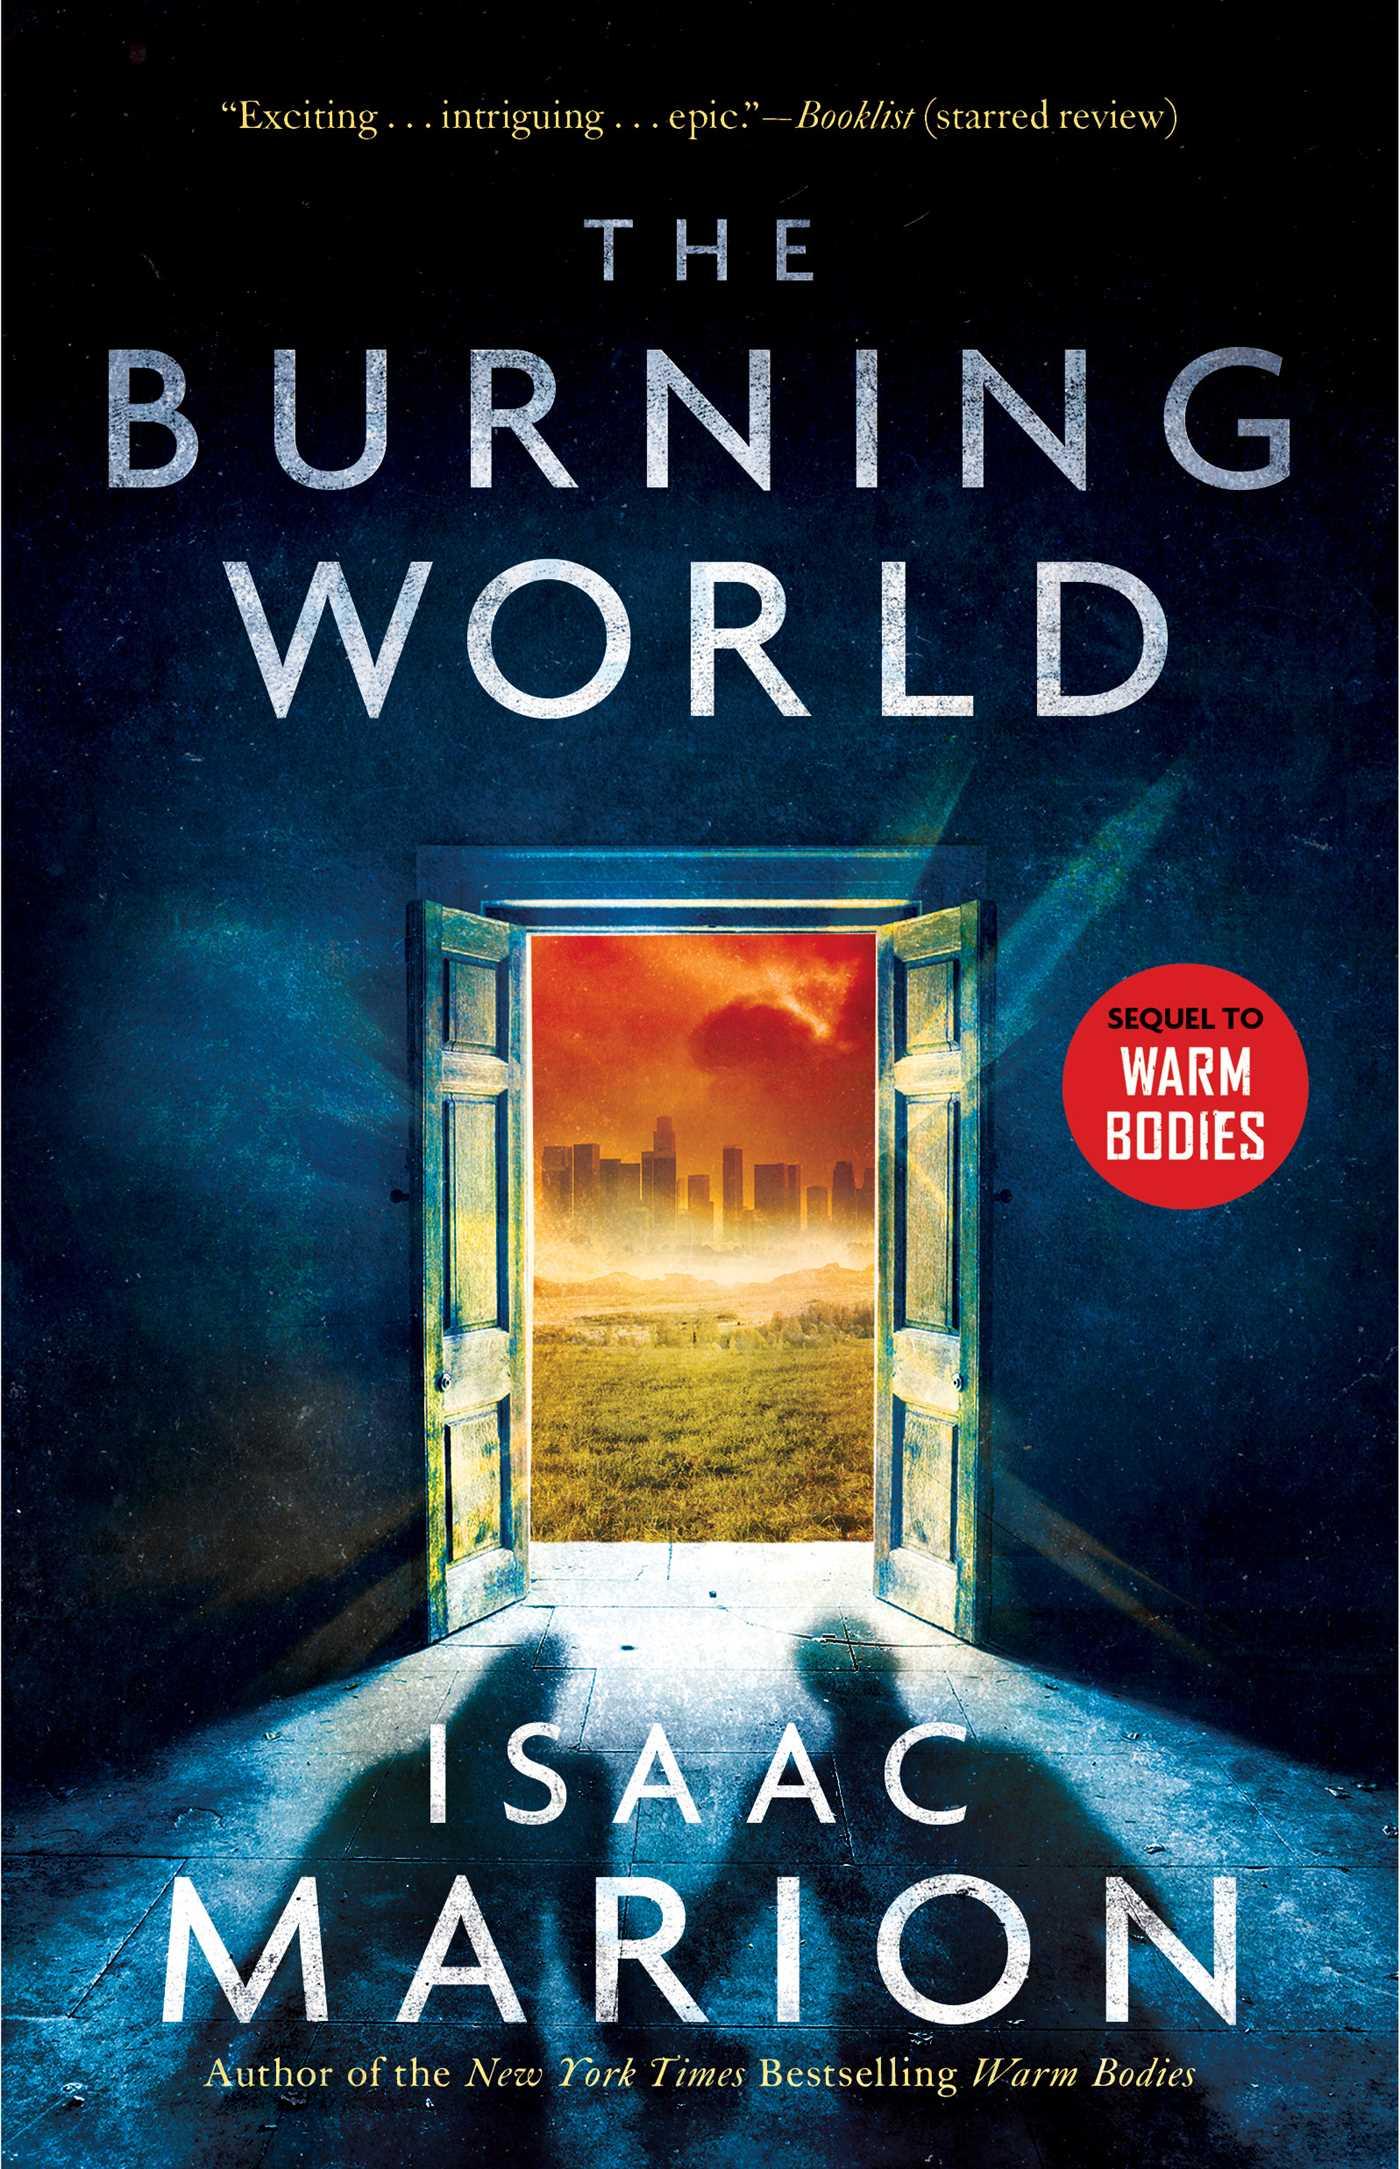 The burning world 9781476799728 hr